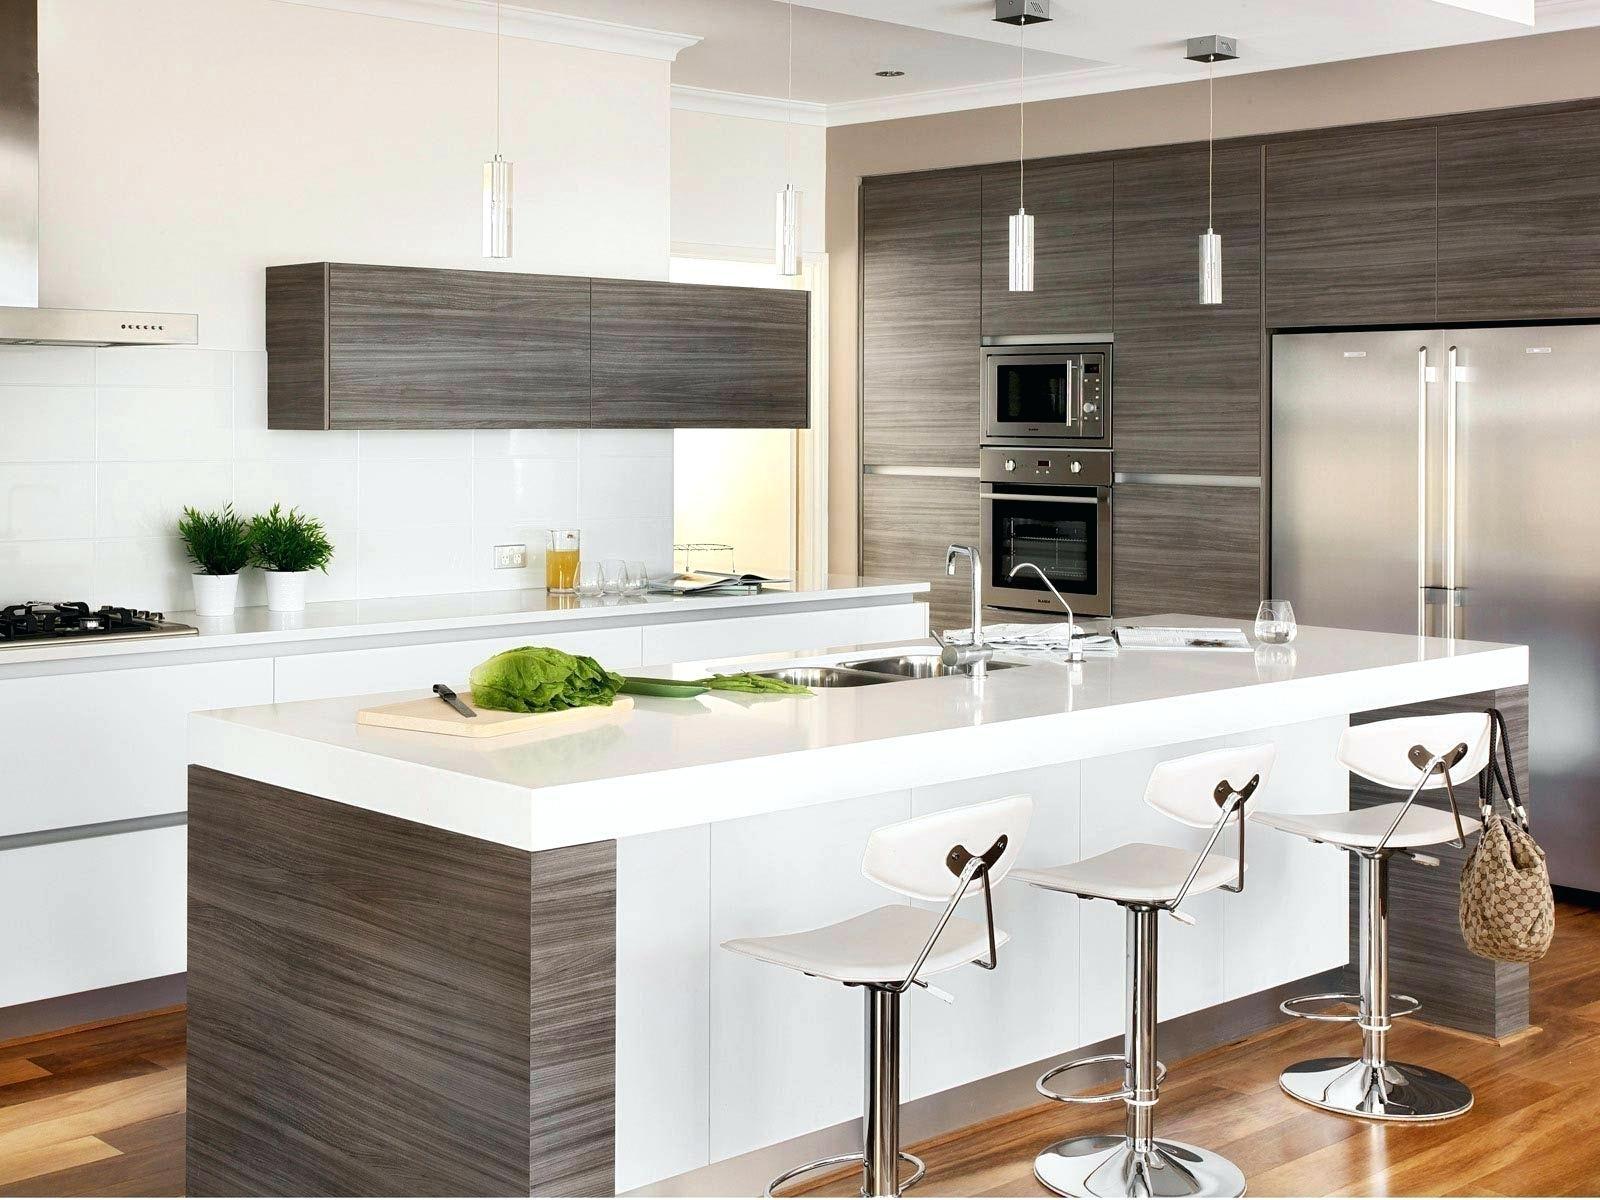 Kitchen Renovation Cost Nz Kitchen Remodel Small Kitchen